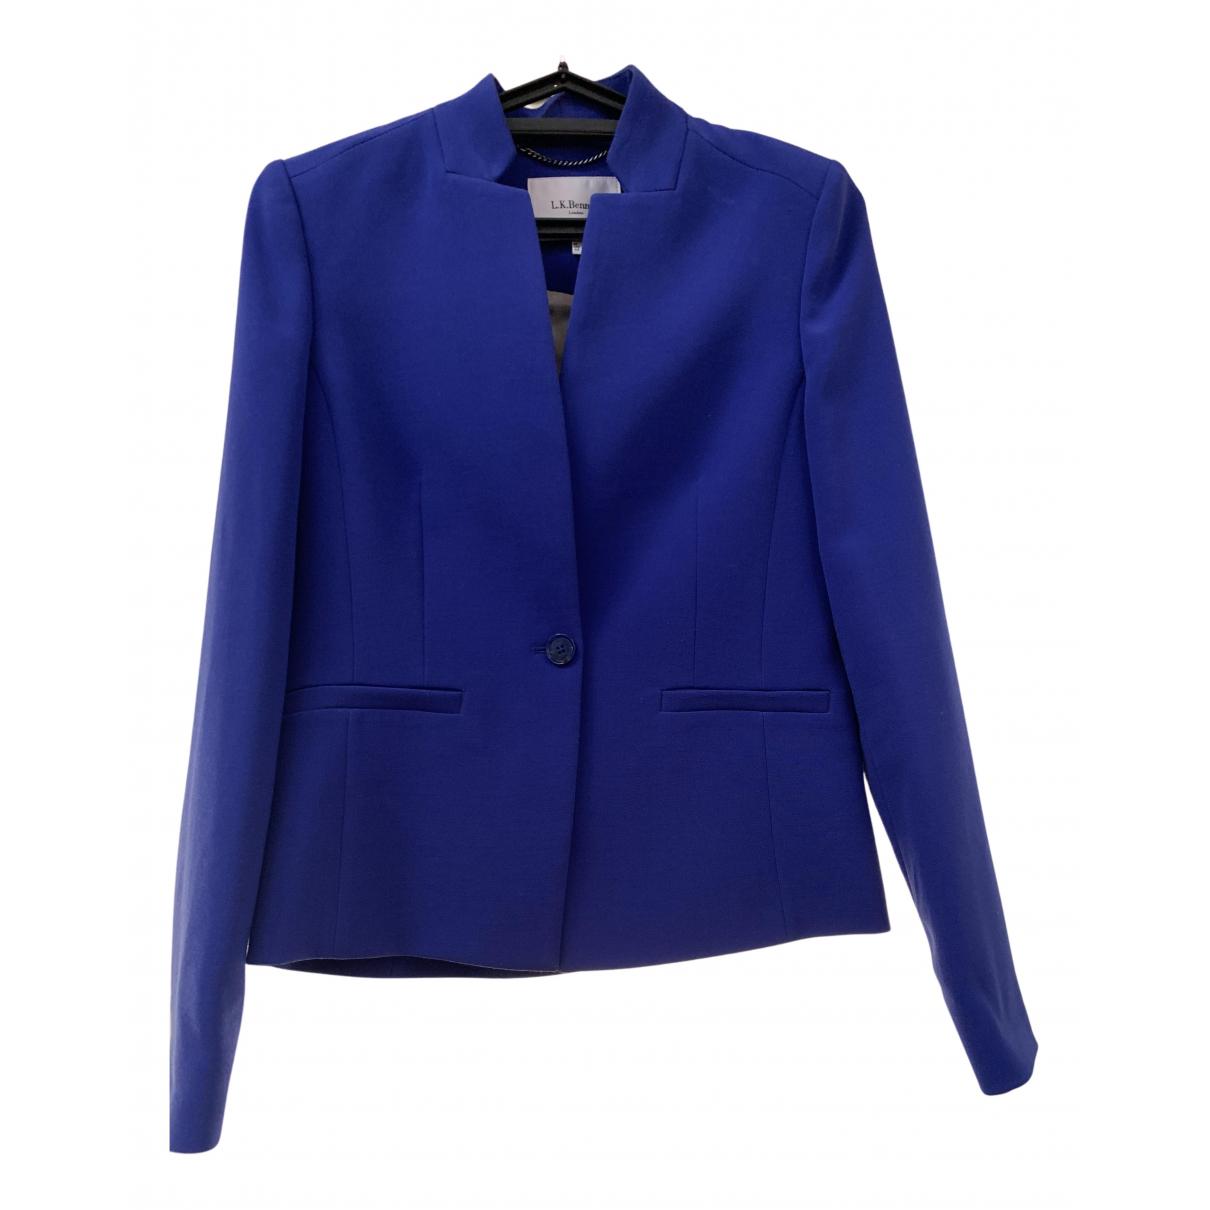 Lk Bennett N Purple jacket for Women 8 UK